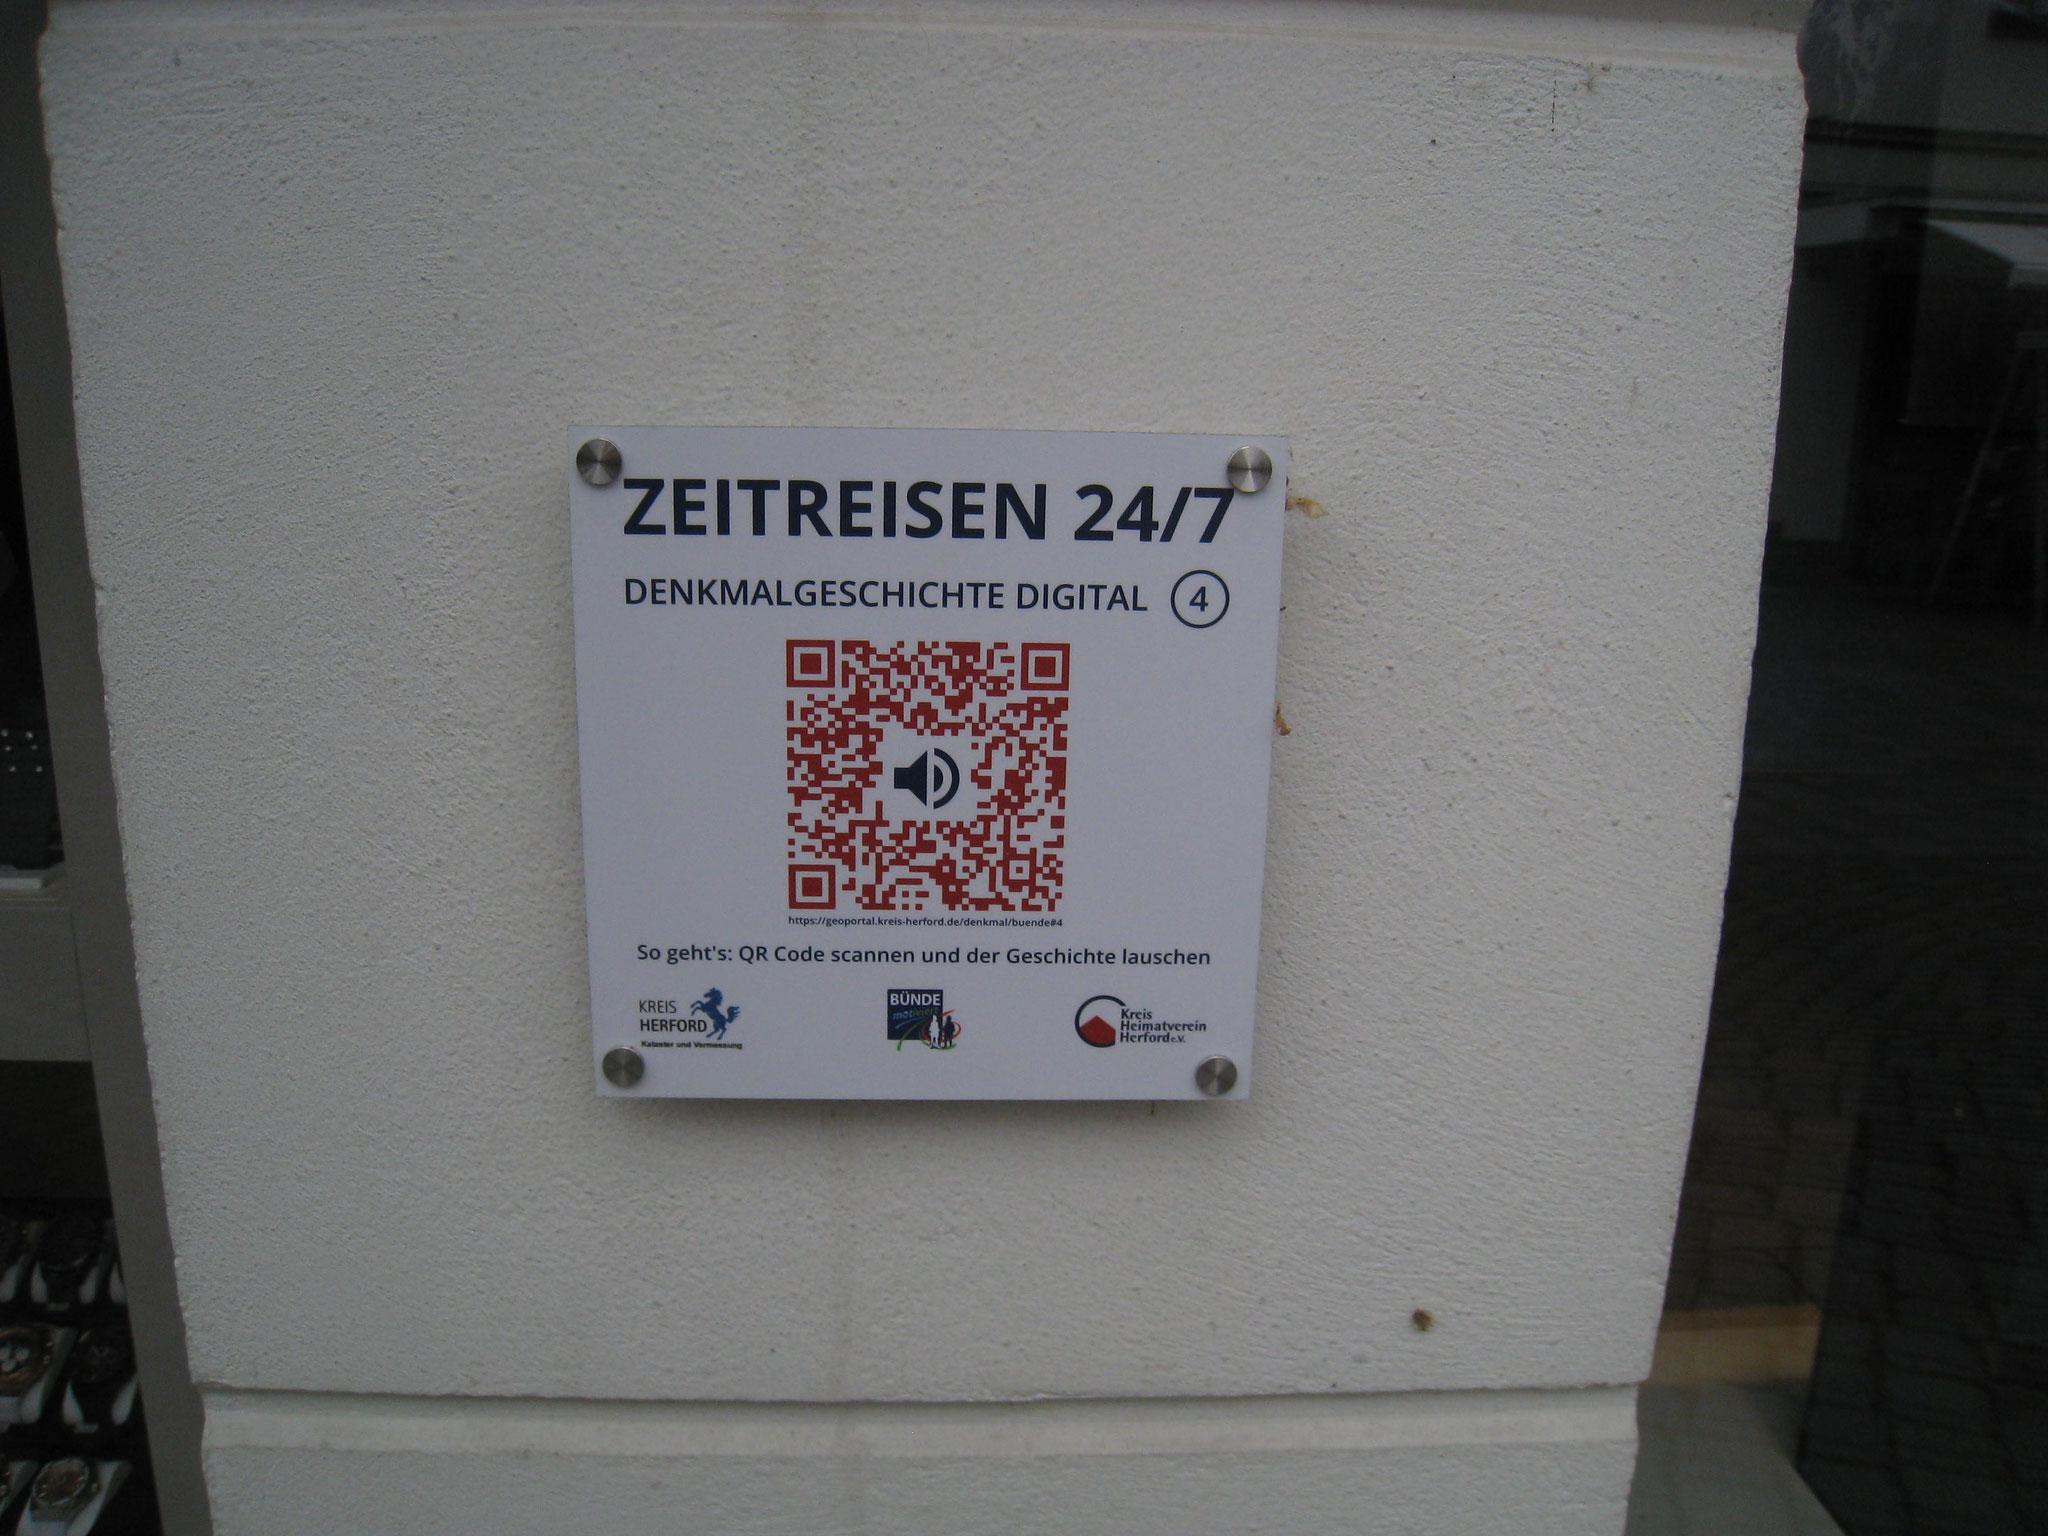 QR-Codes an Bünder Denkmälern